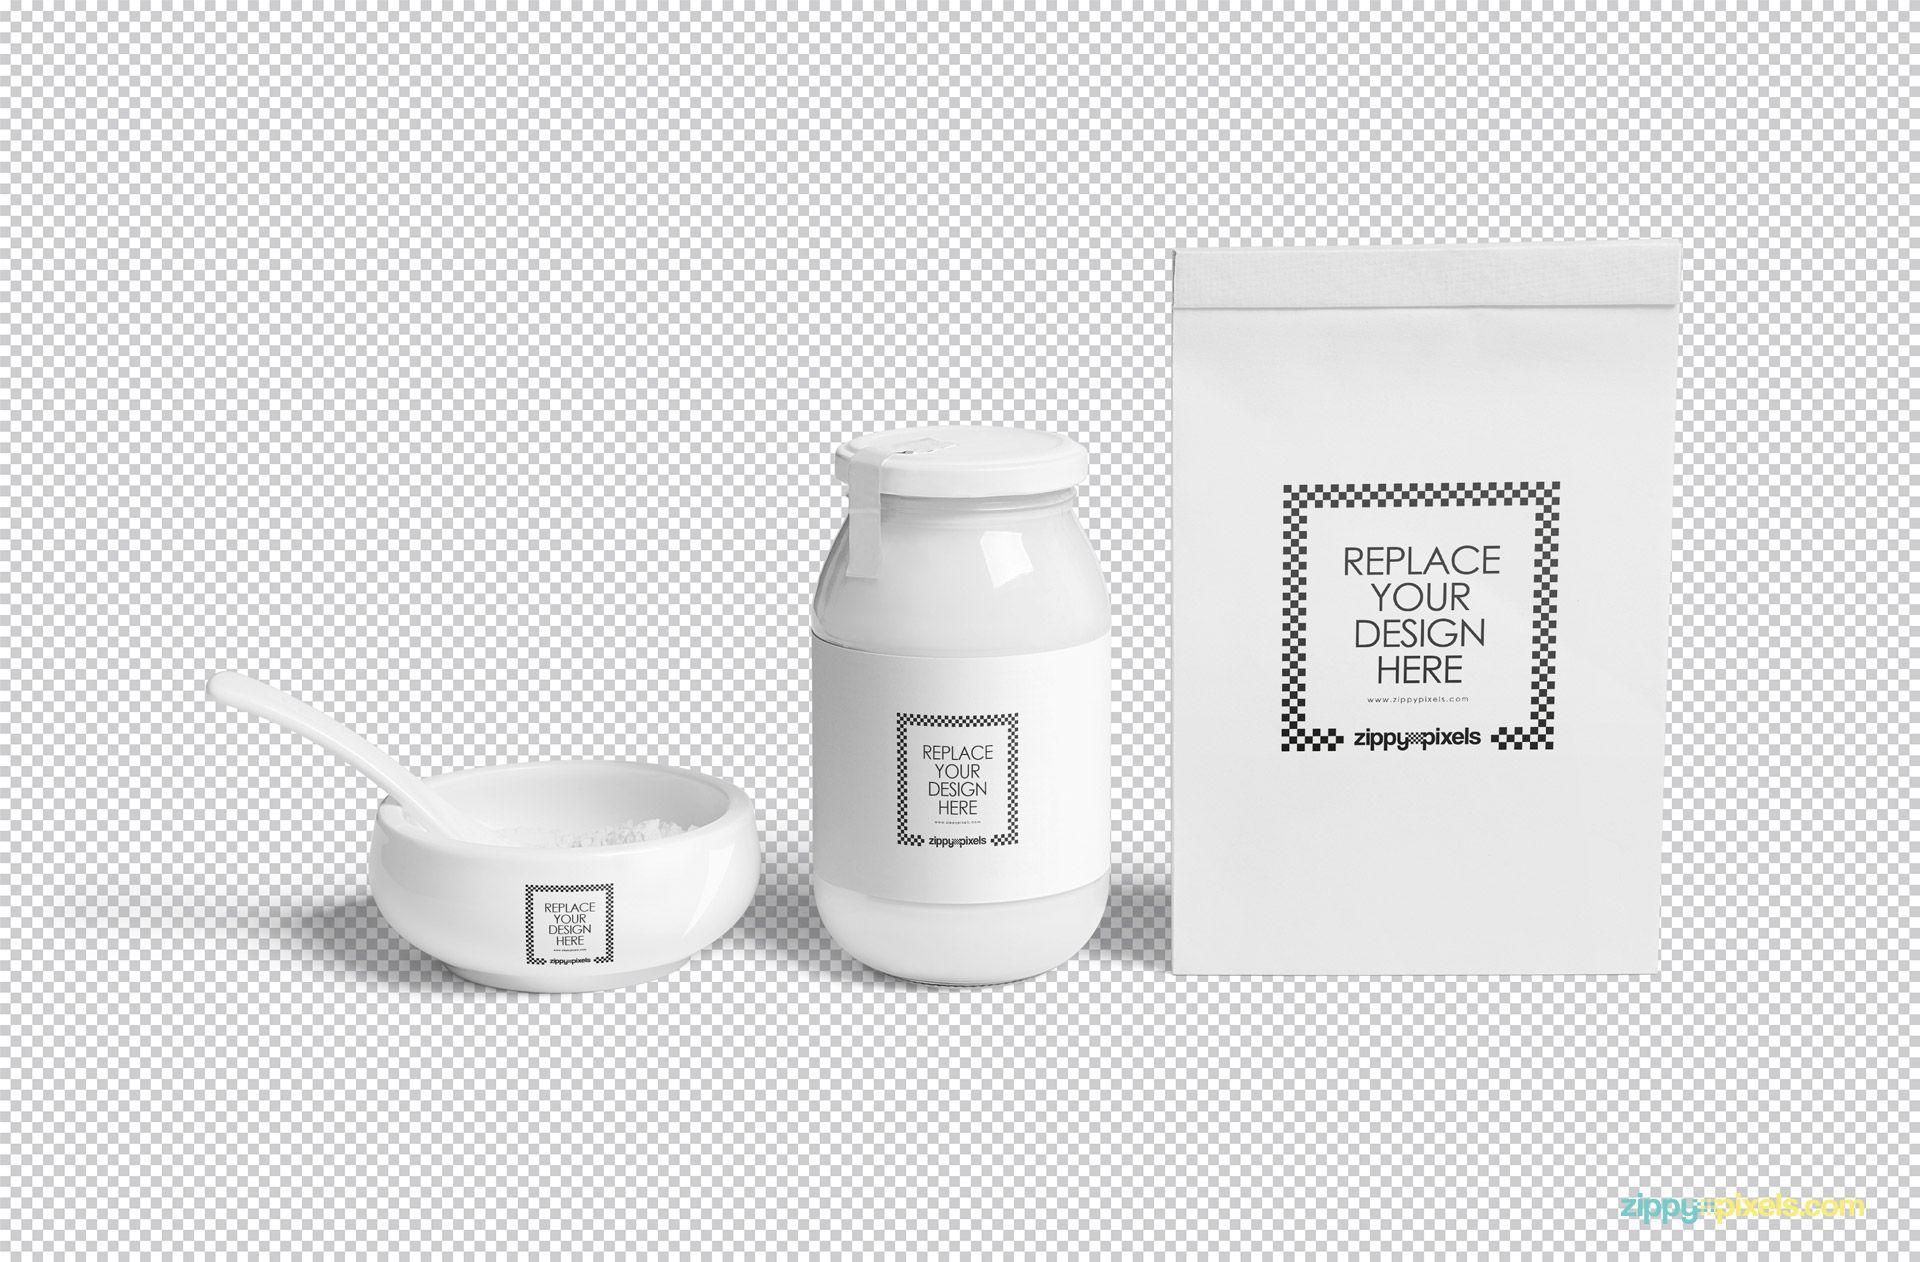 Download Free Jar Mockup Zippypixels Packaging Mockup Jar Mockup